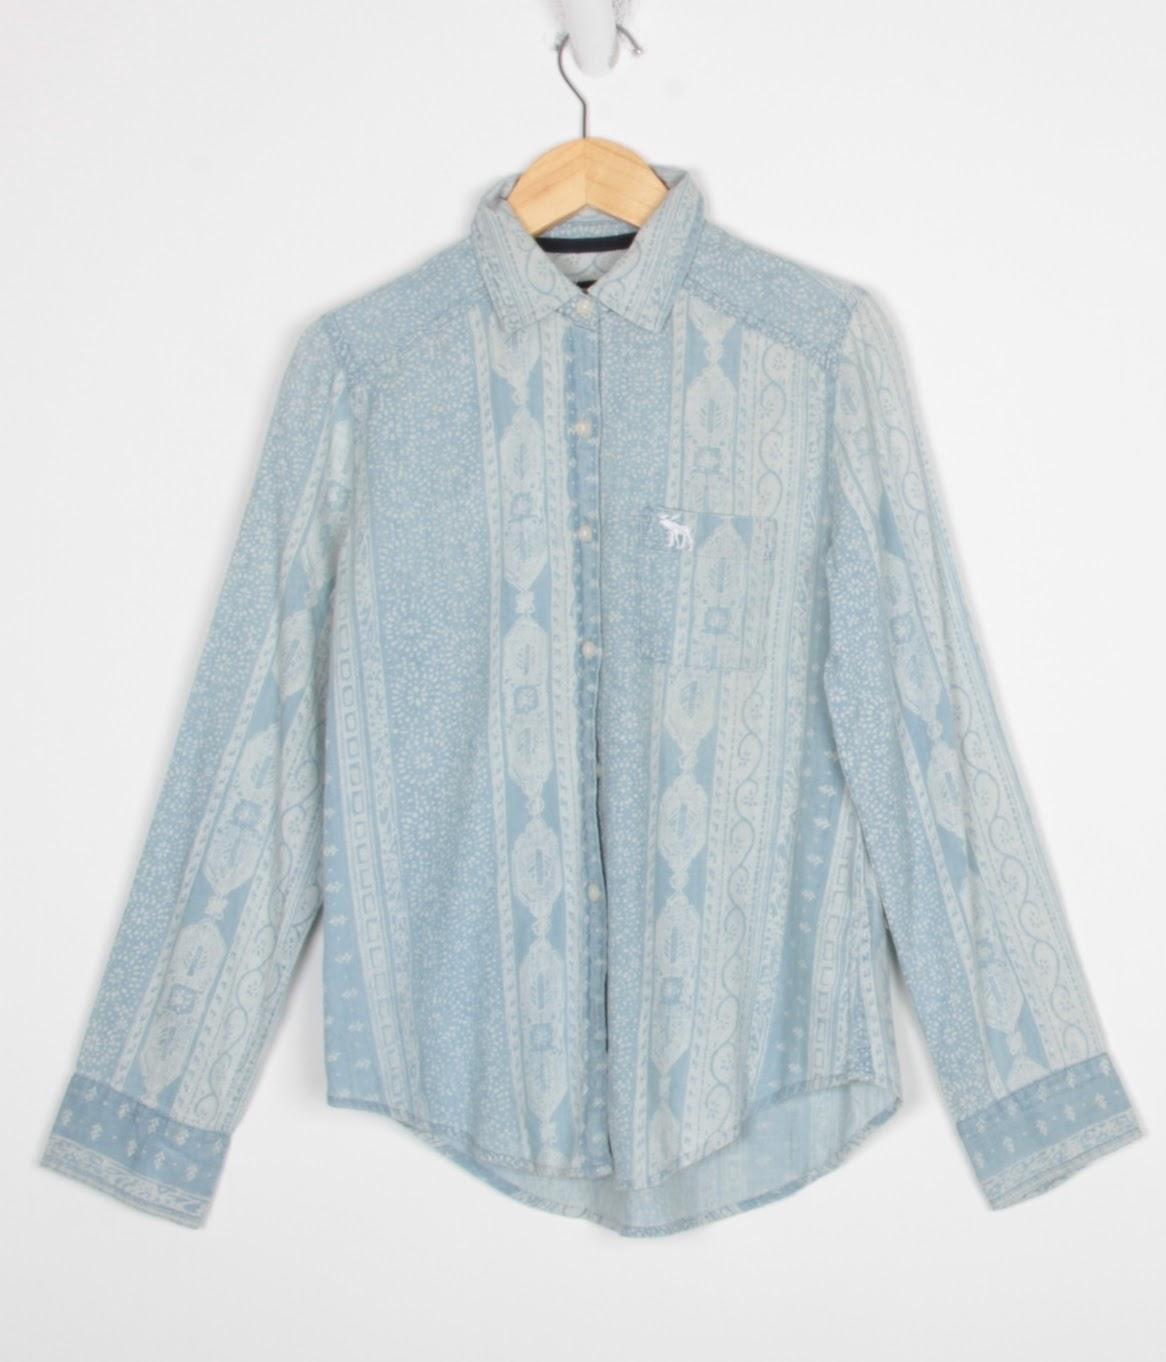 Camisa Manga Longa - Abercrombie - 09 Anos